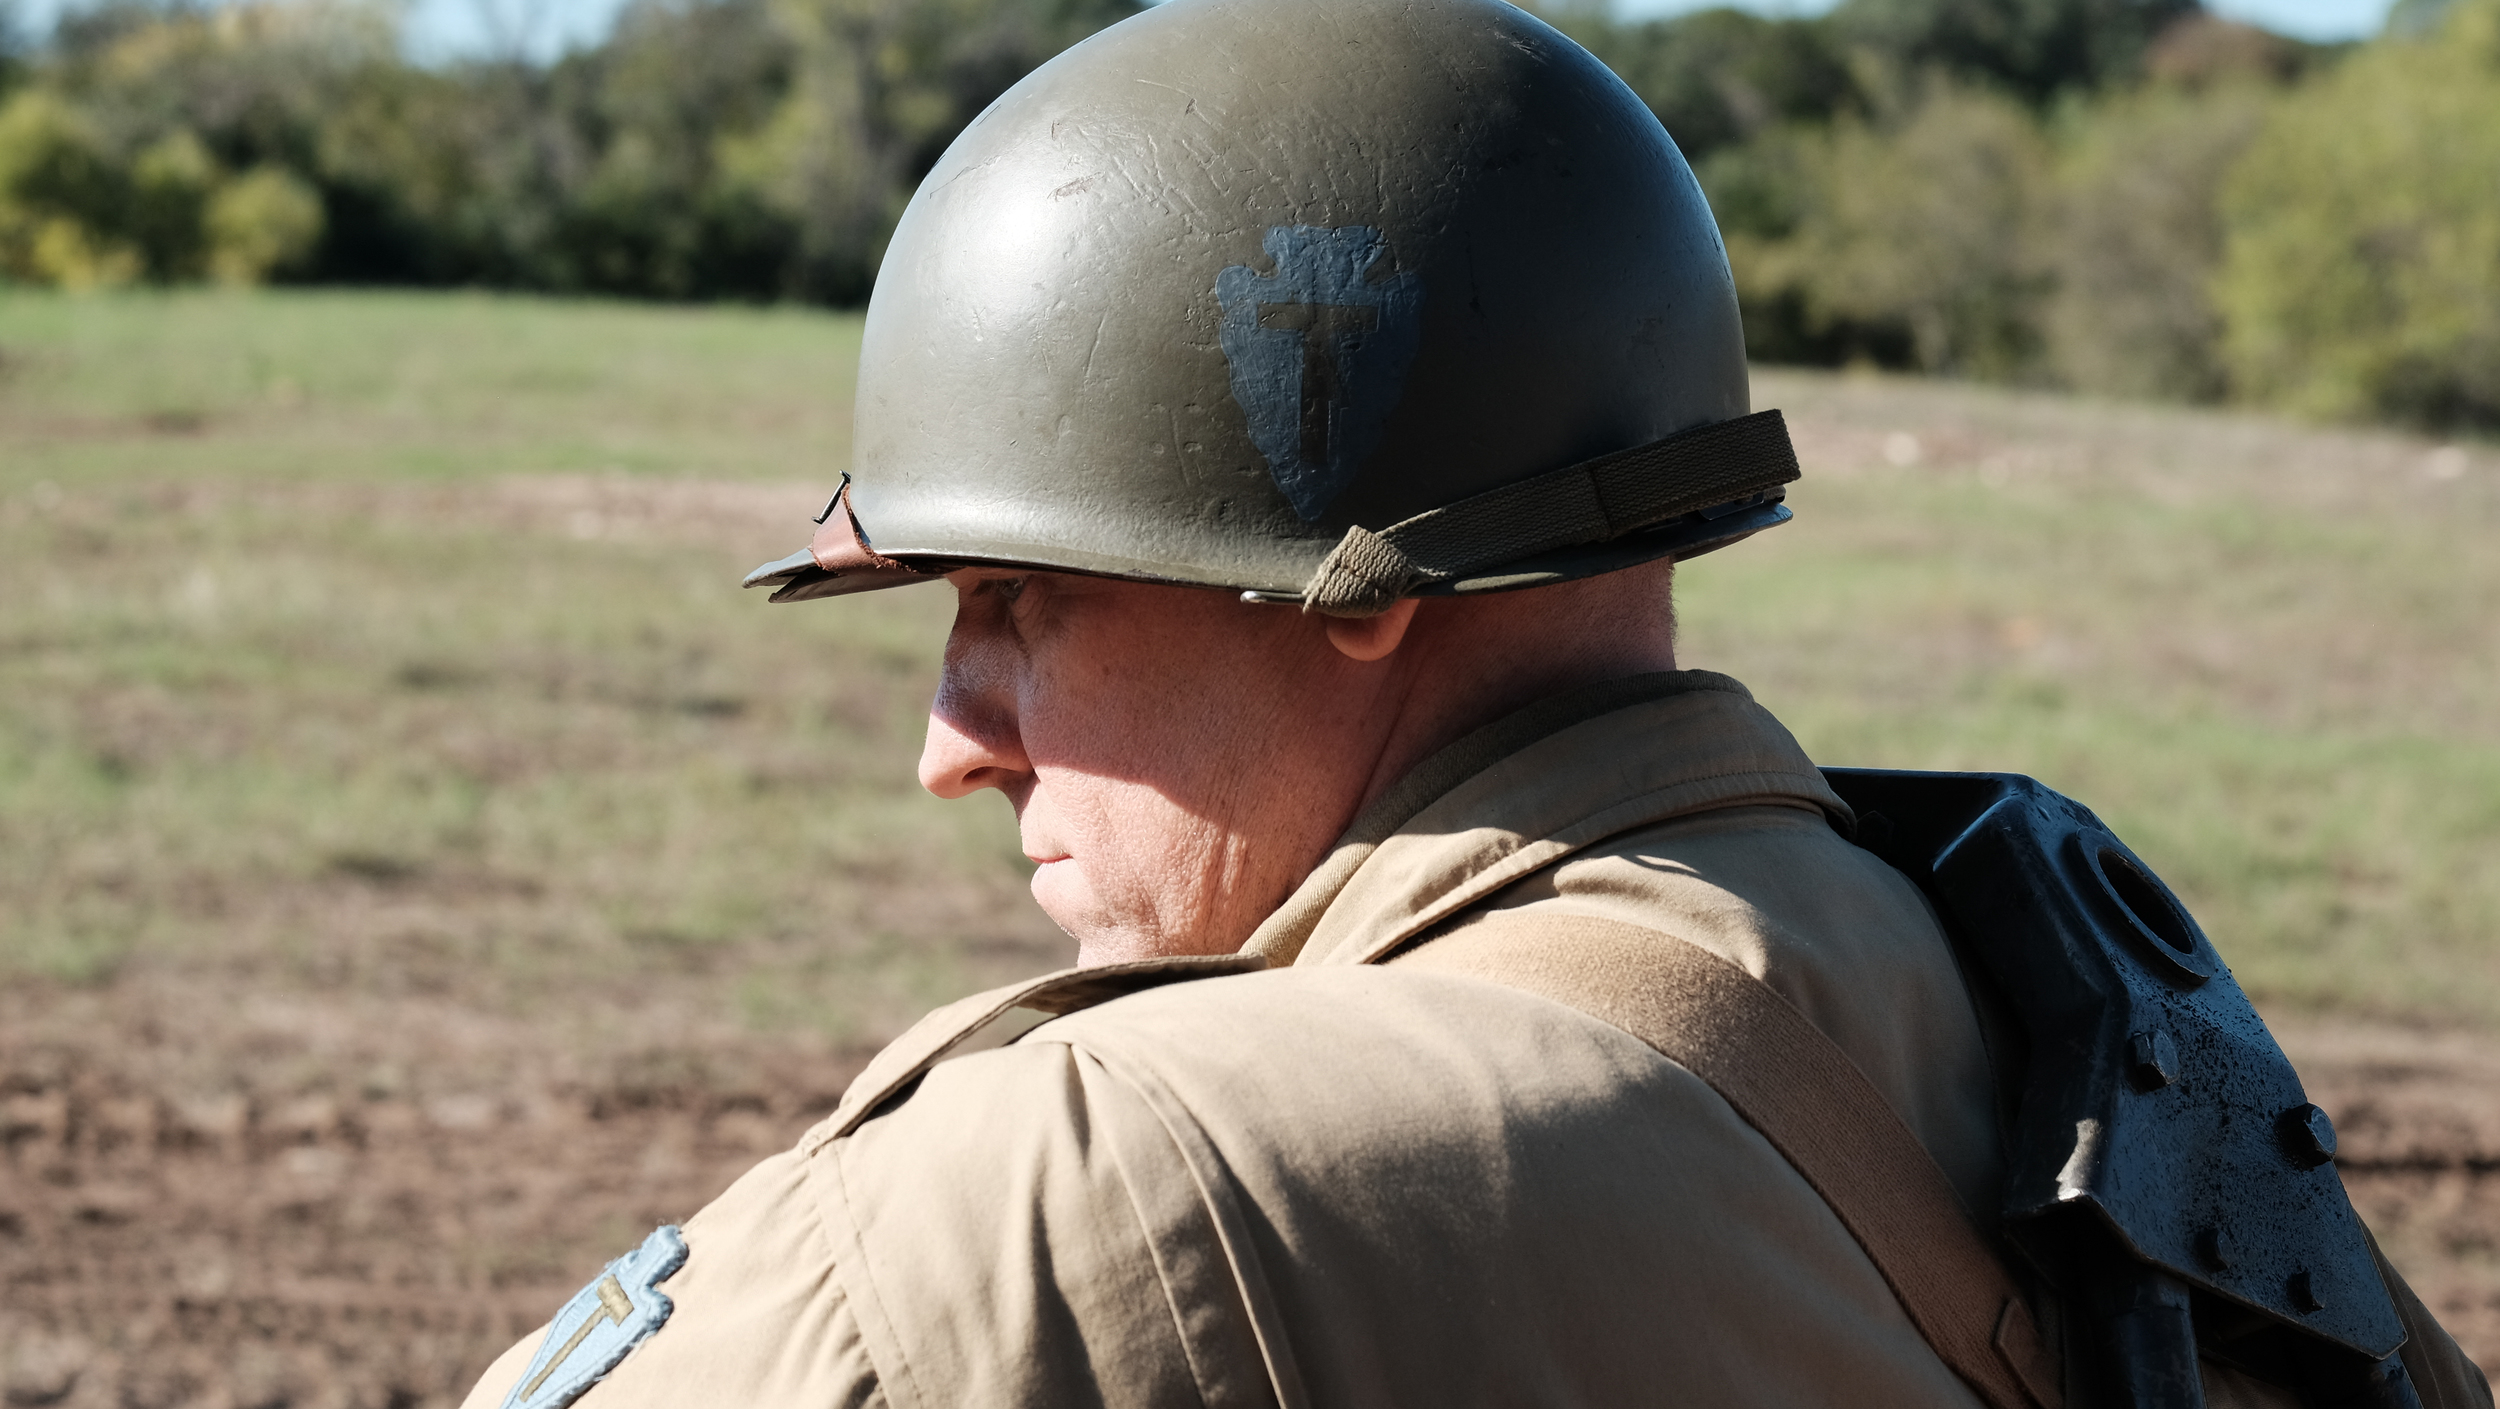 camp-mabry-close-assault-110815-5111.jpg